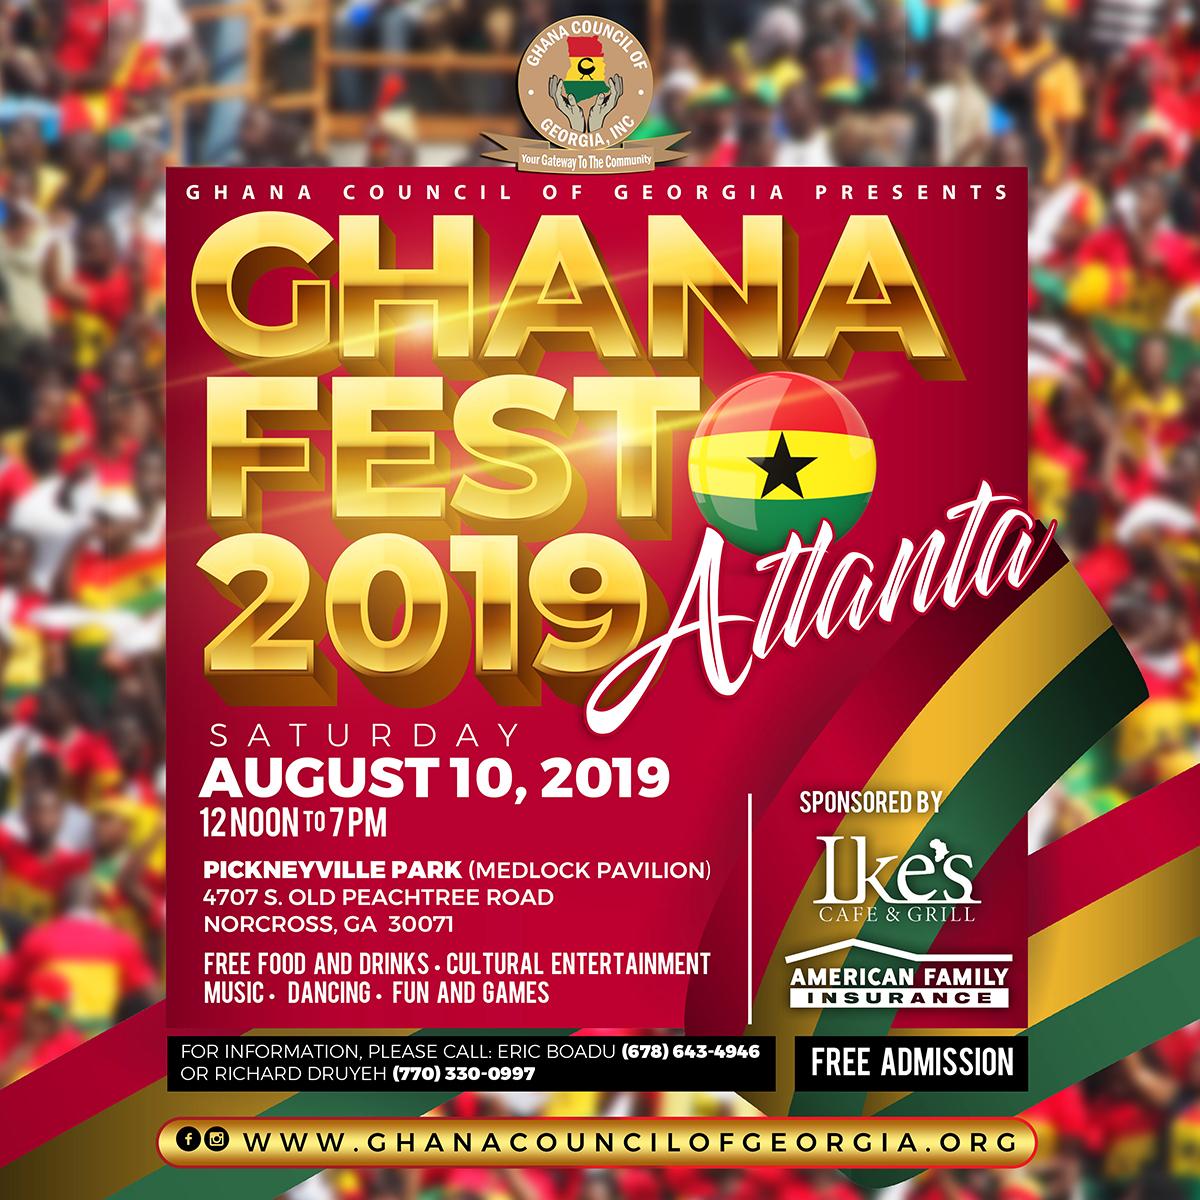 GhanaFest2019_1200